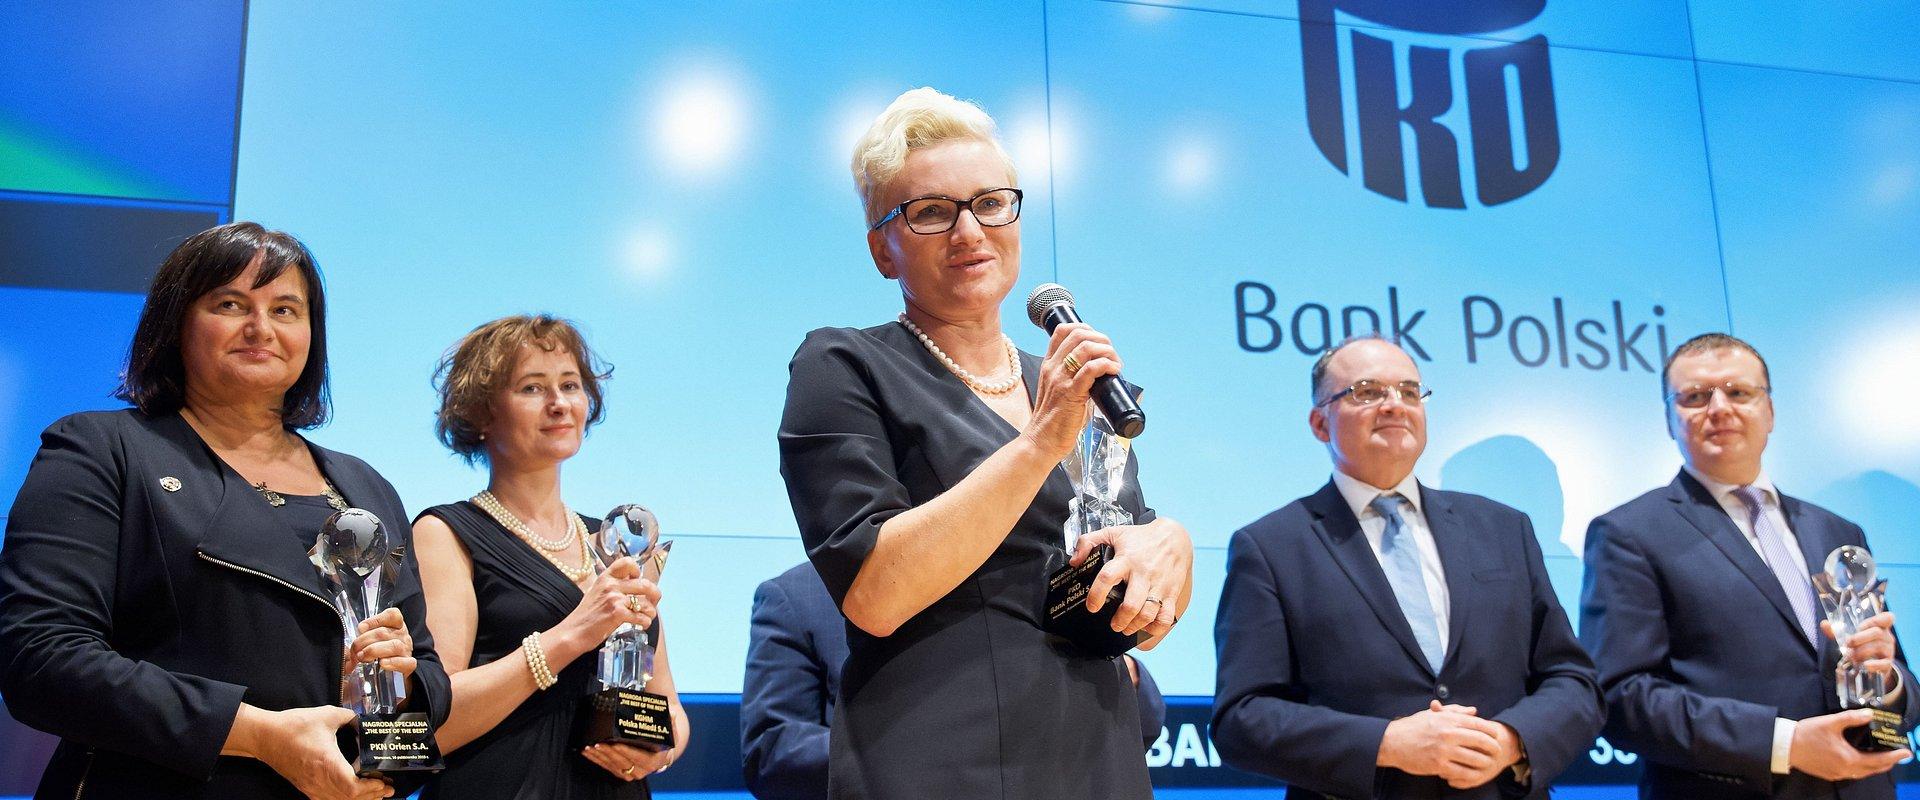 PKO Bank Polski liderem konkursu The Best Annual Report 2018